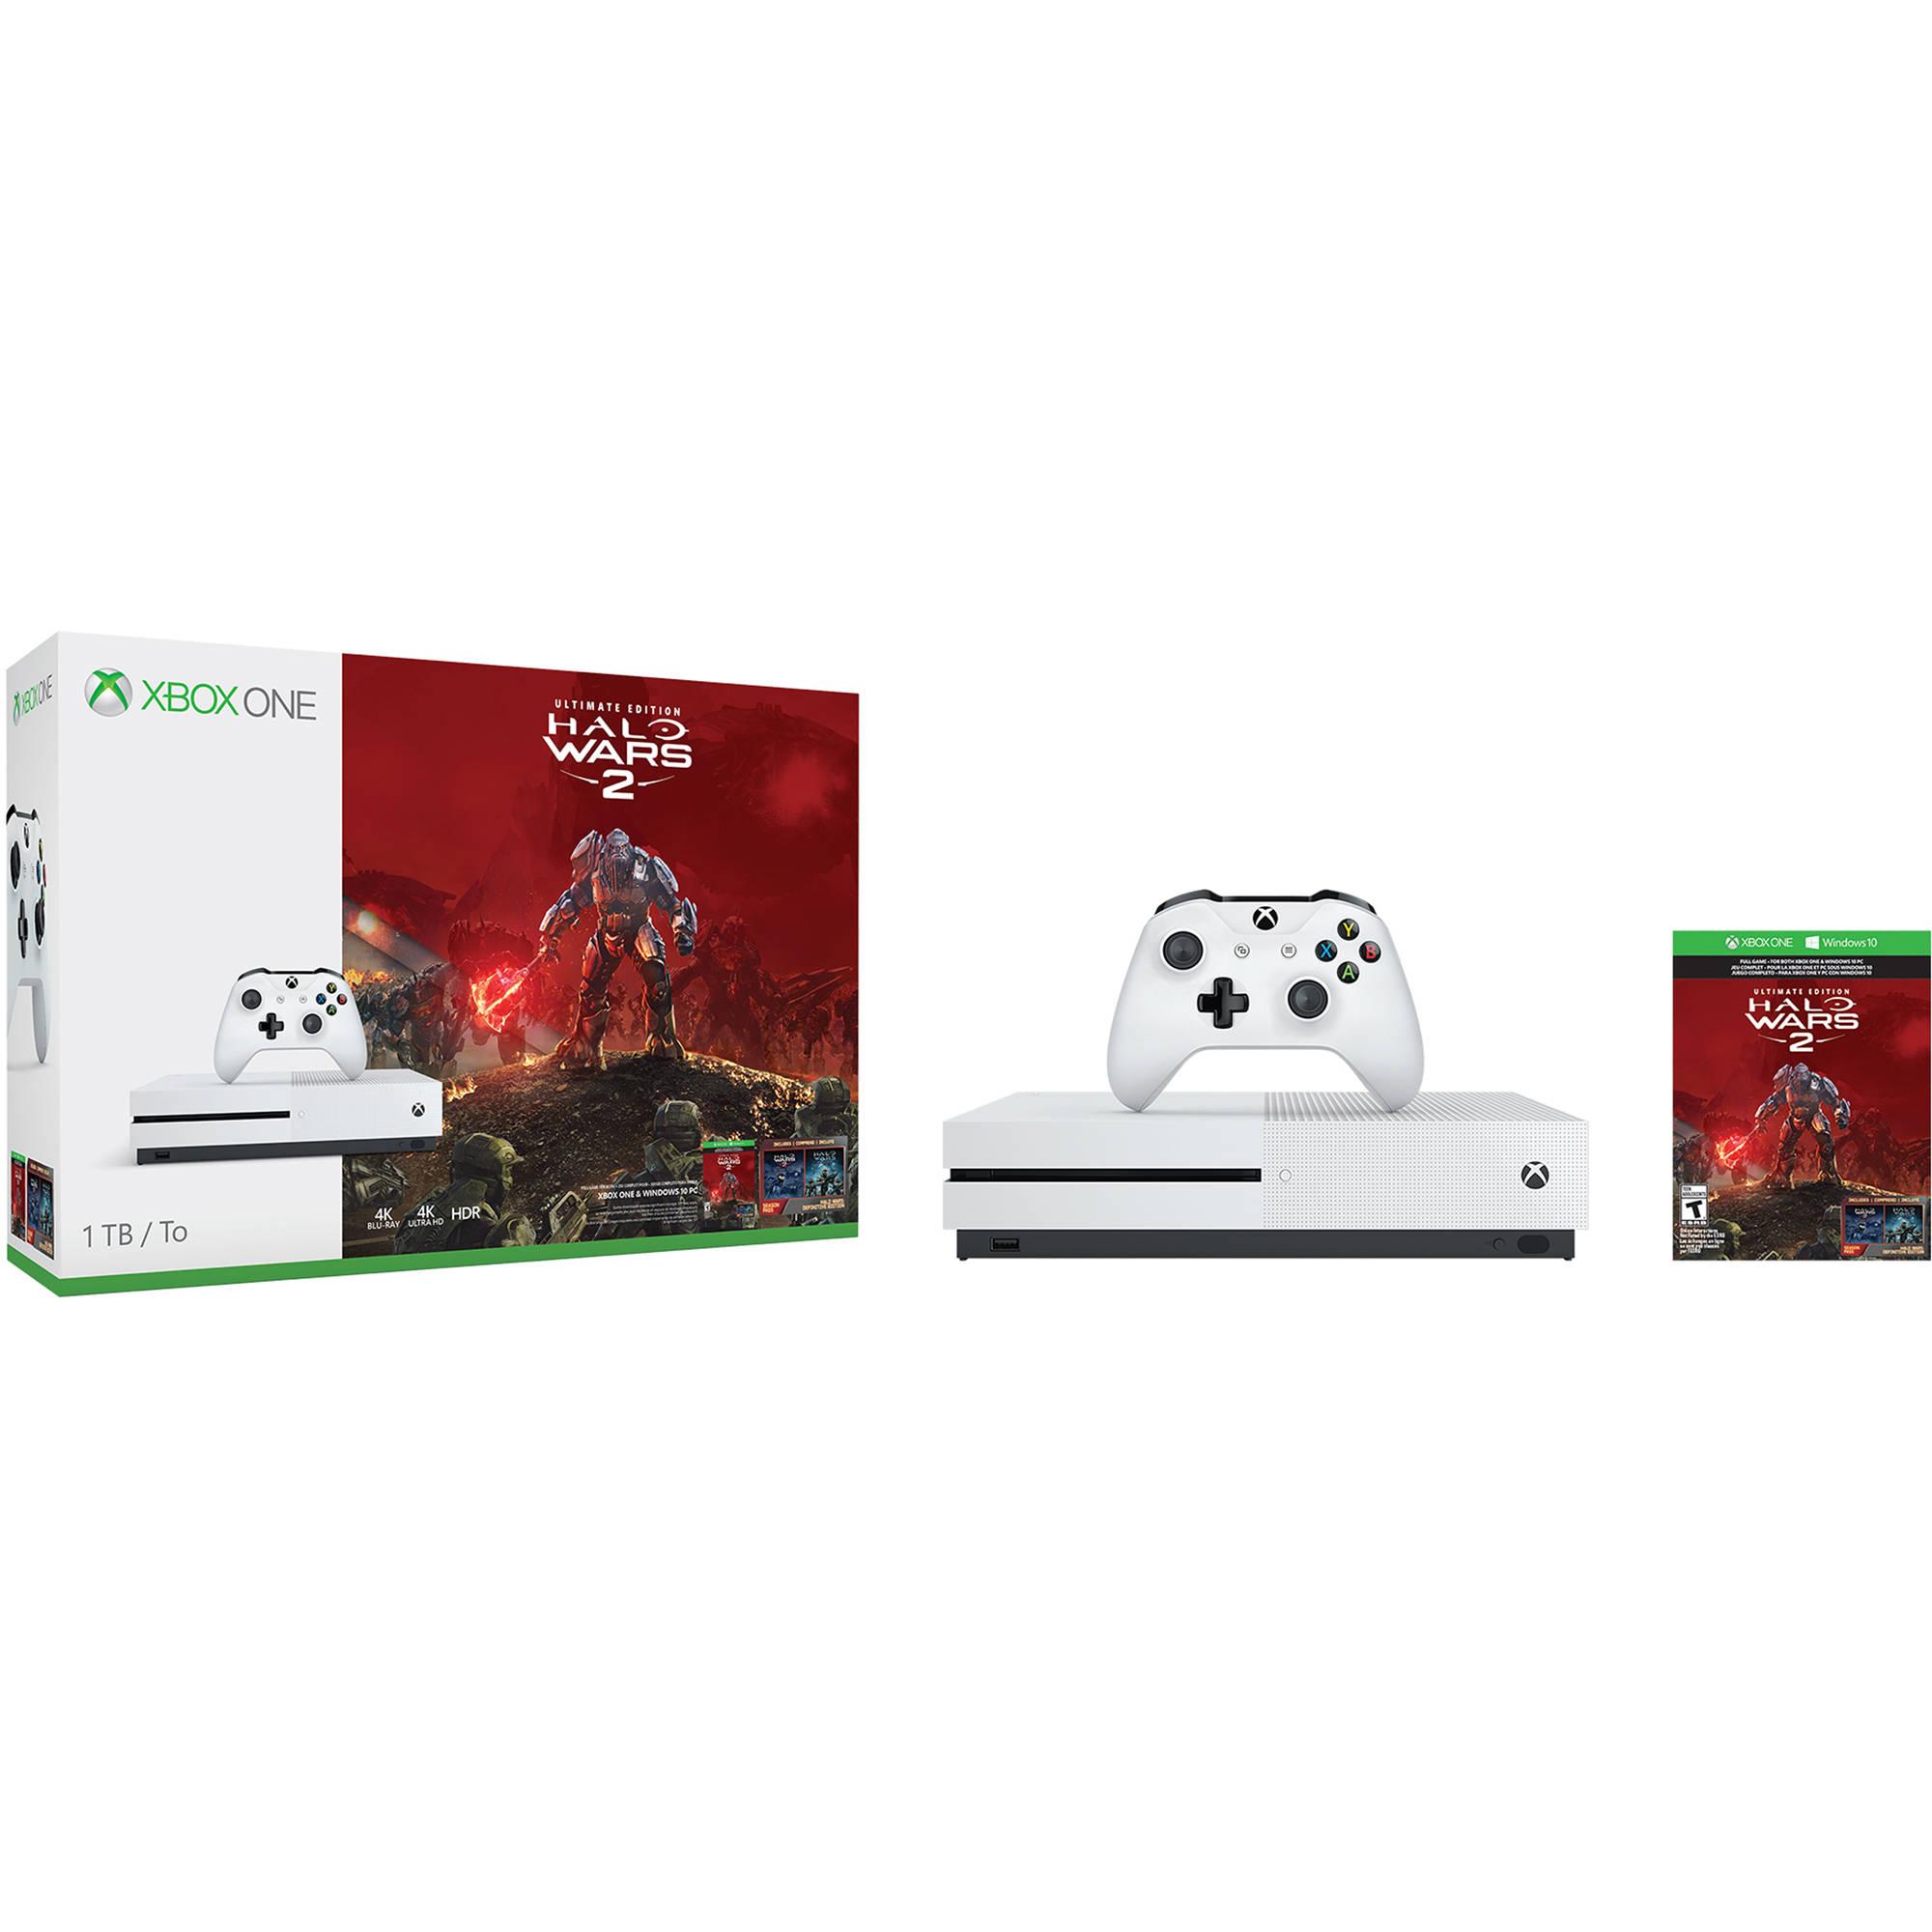 Microsoft Xbox One S Halo Wars 2 Bundle